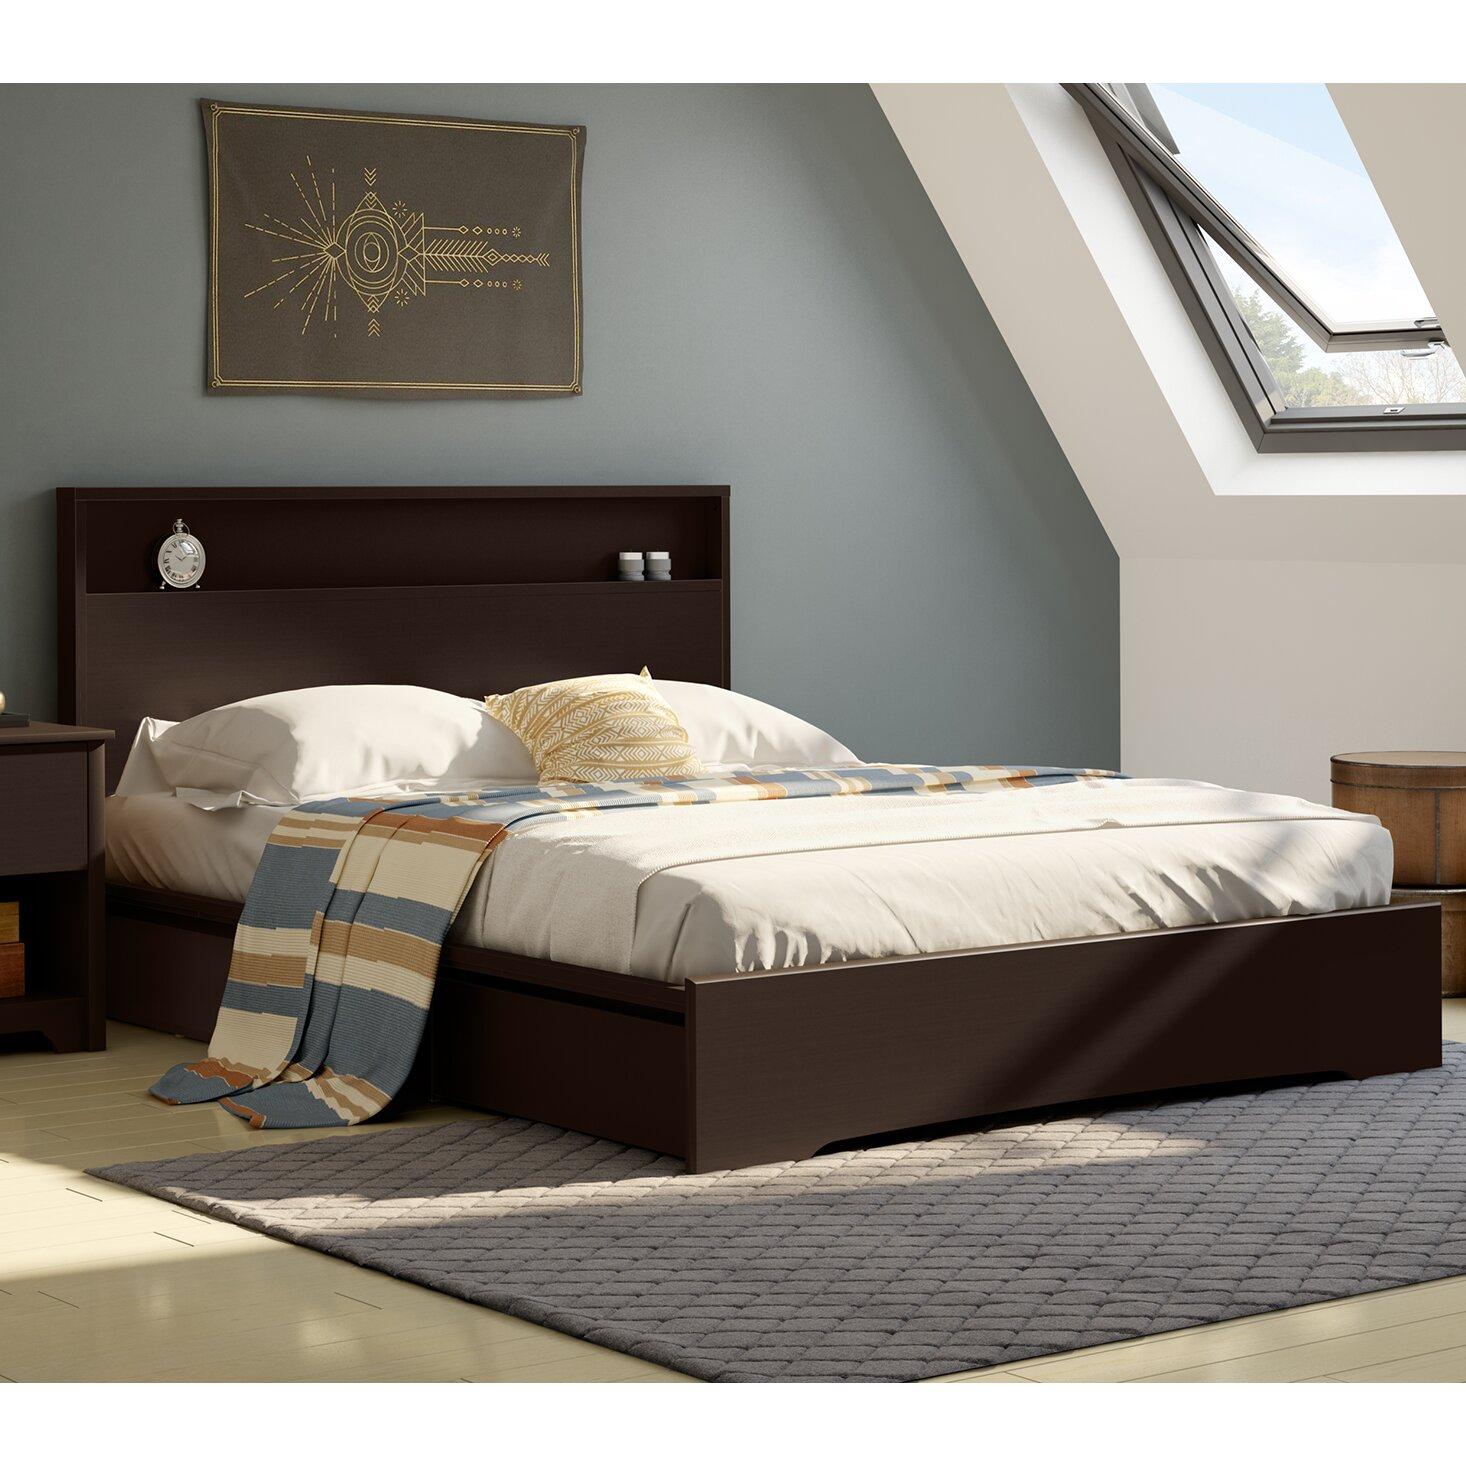 south shore queen storage platform bed reviews wayfair. Black Bedroom Furniture Sets. Home Design Ideas